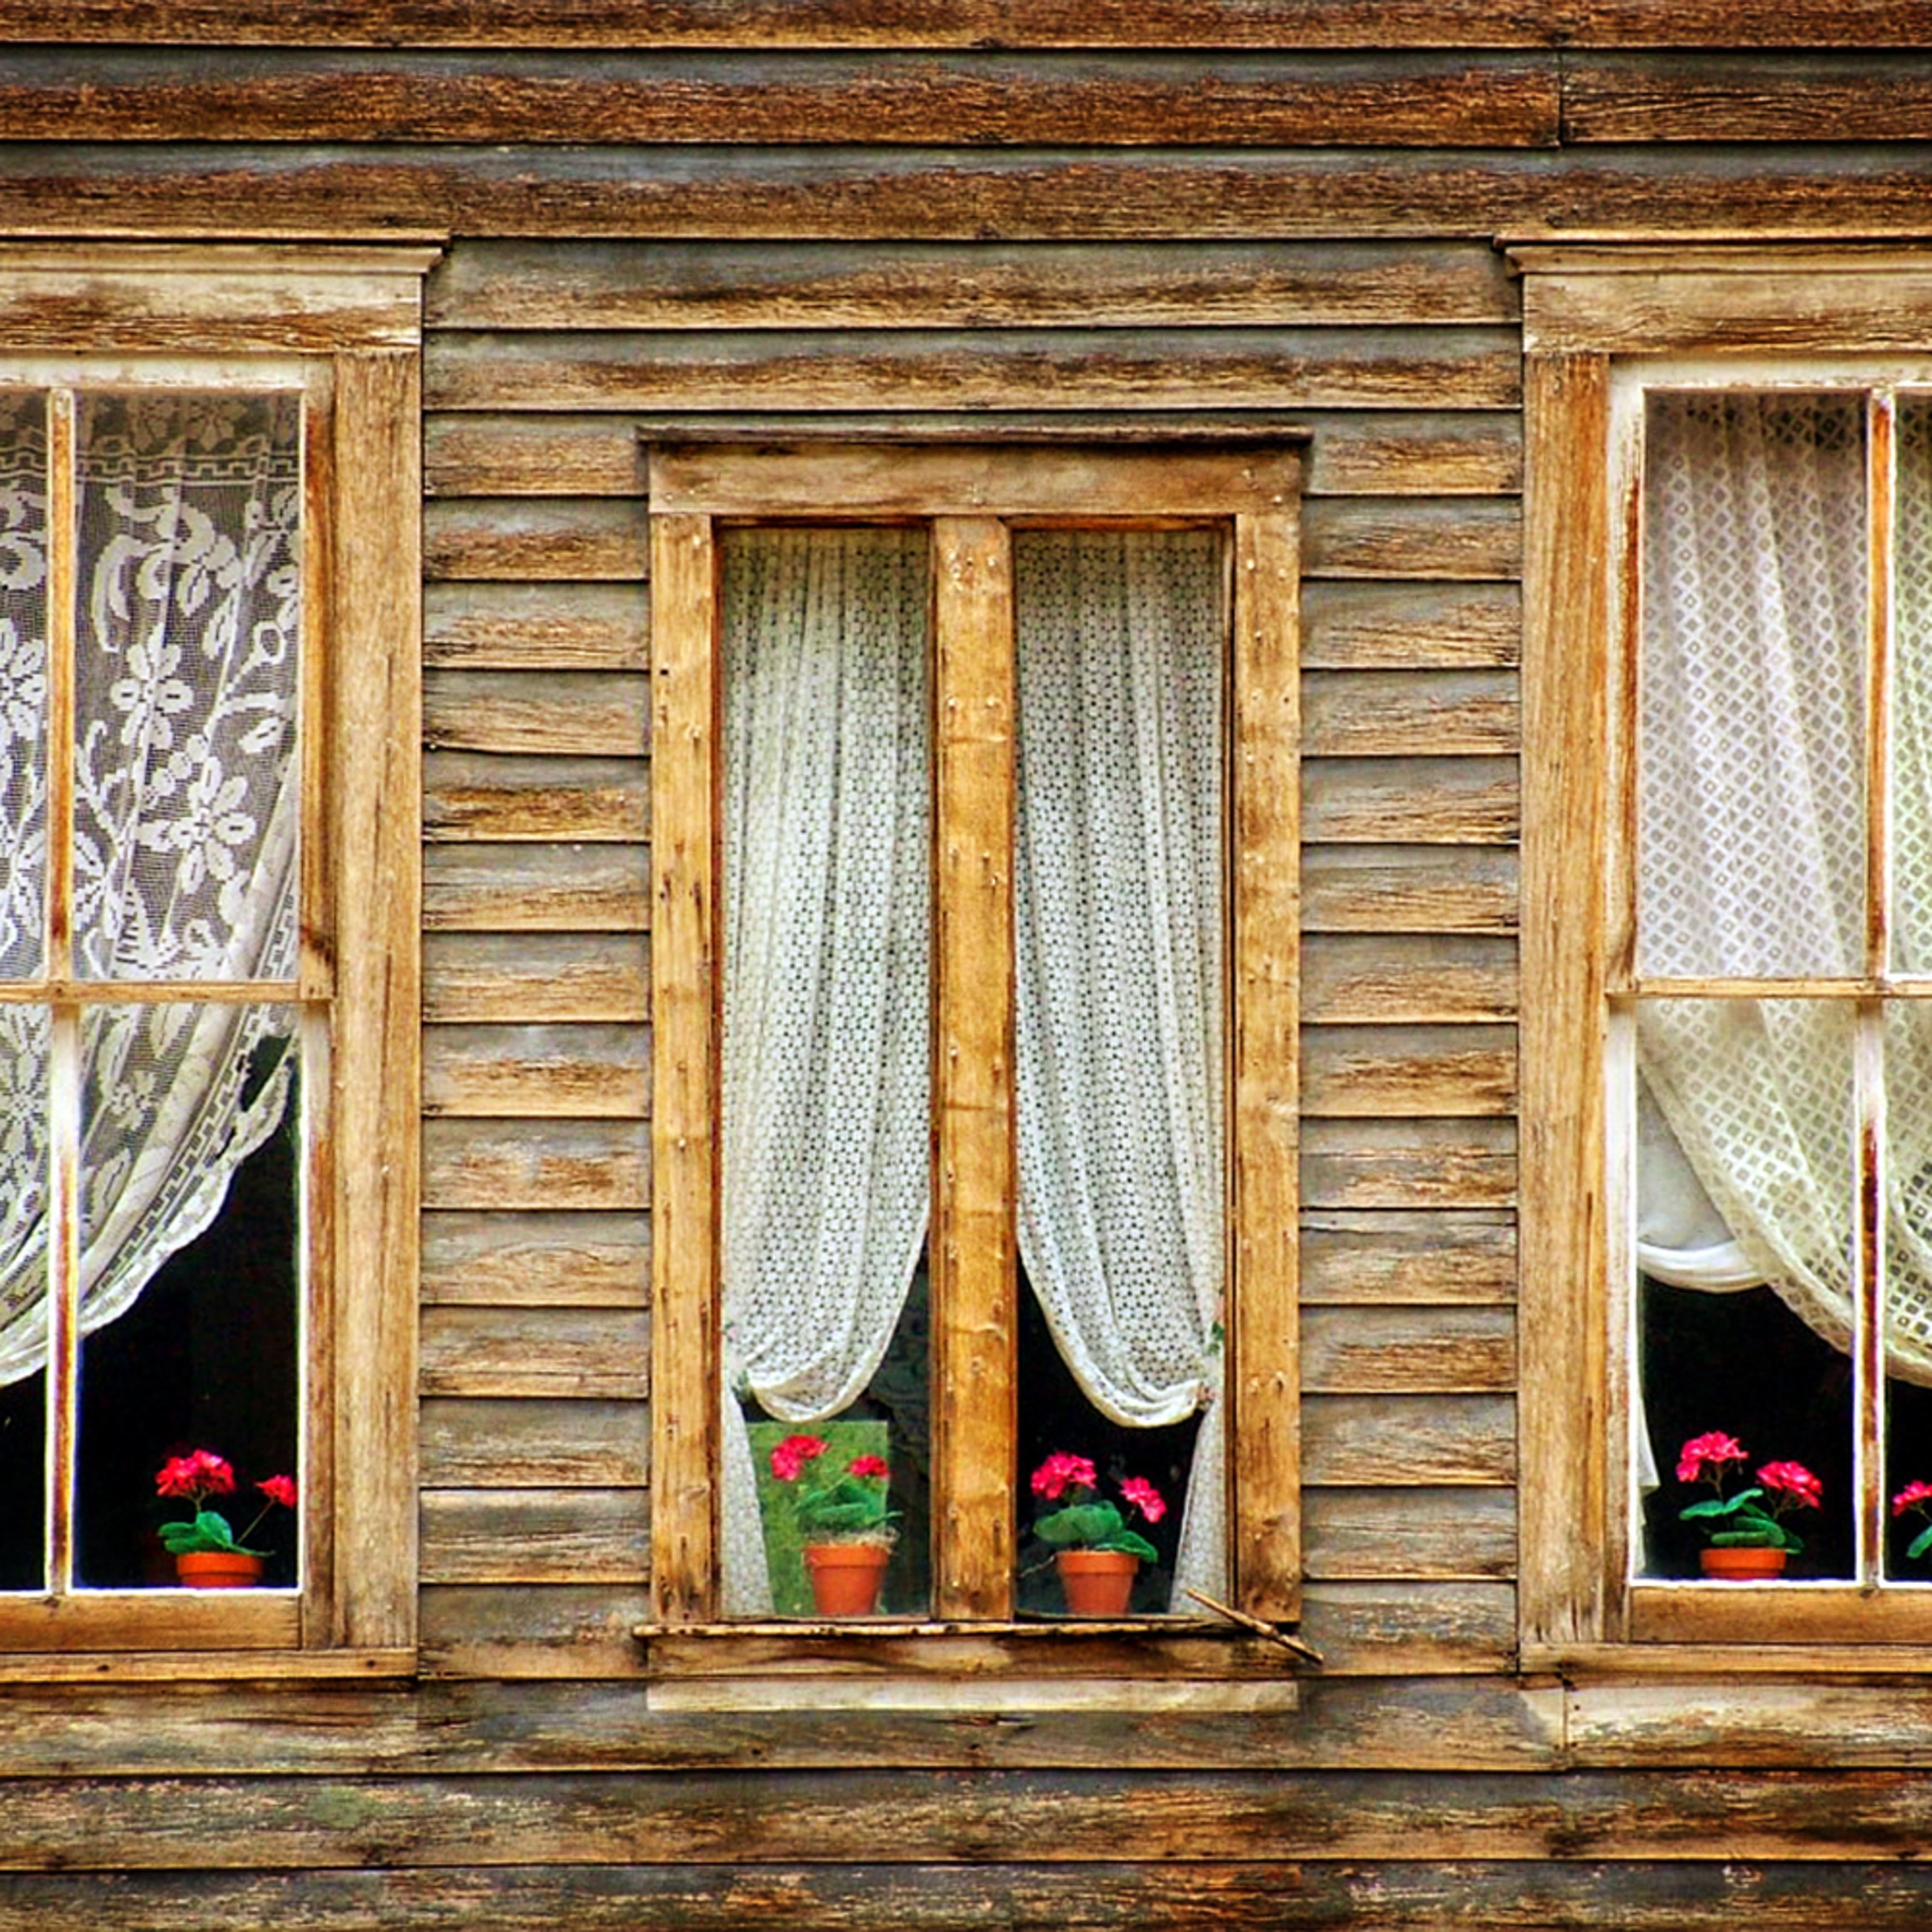 Windows of st elmo jie3ra